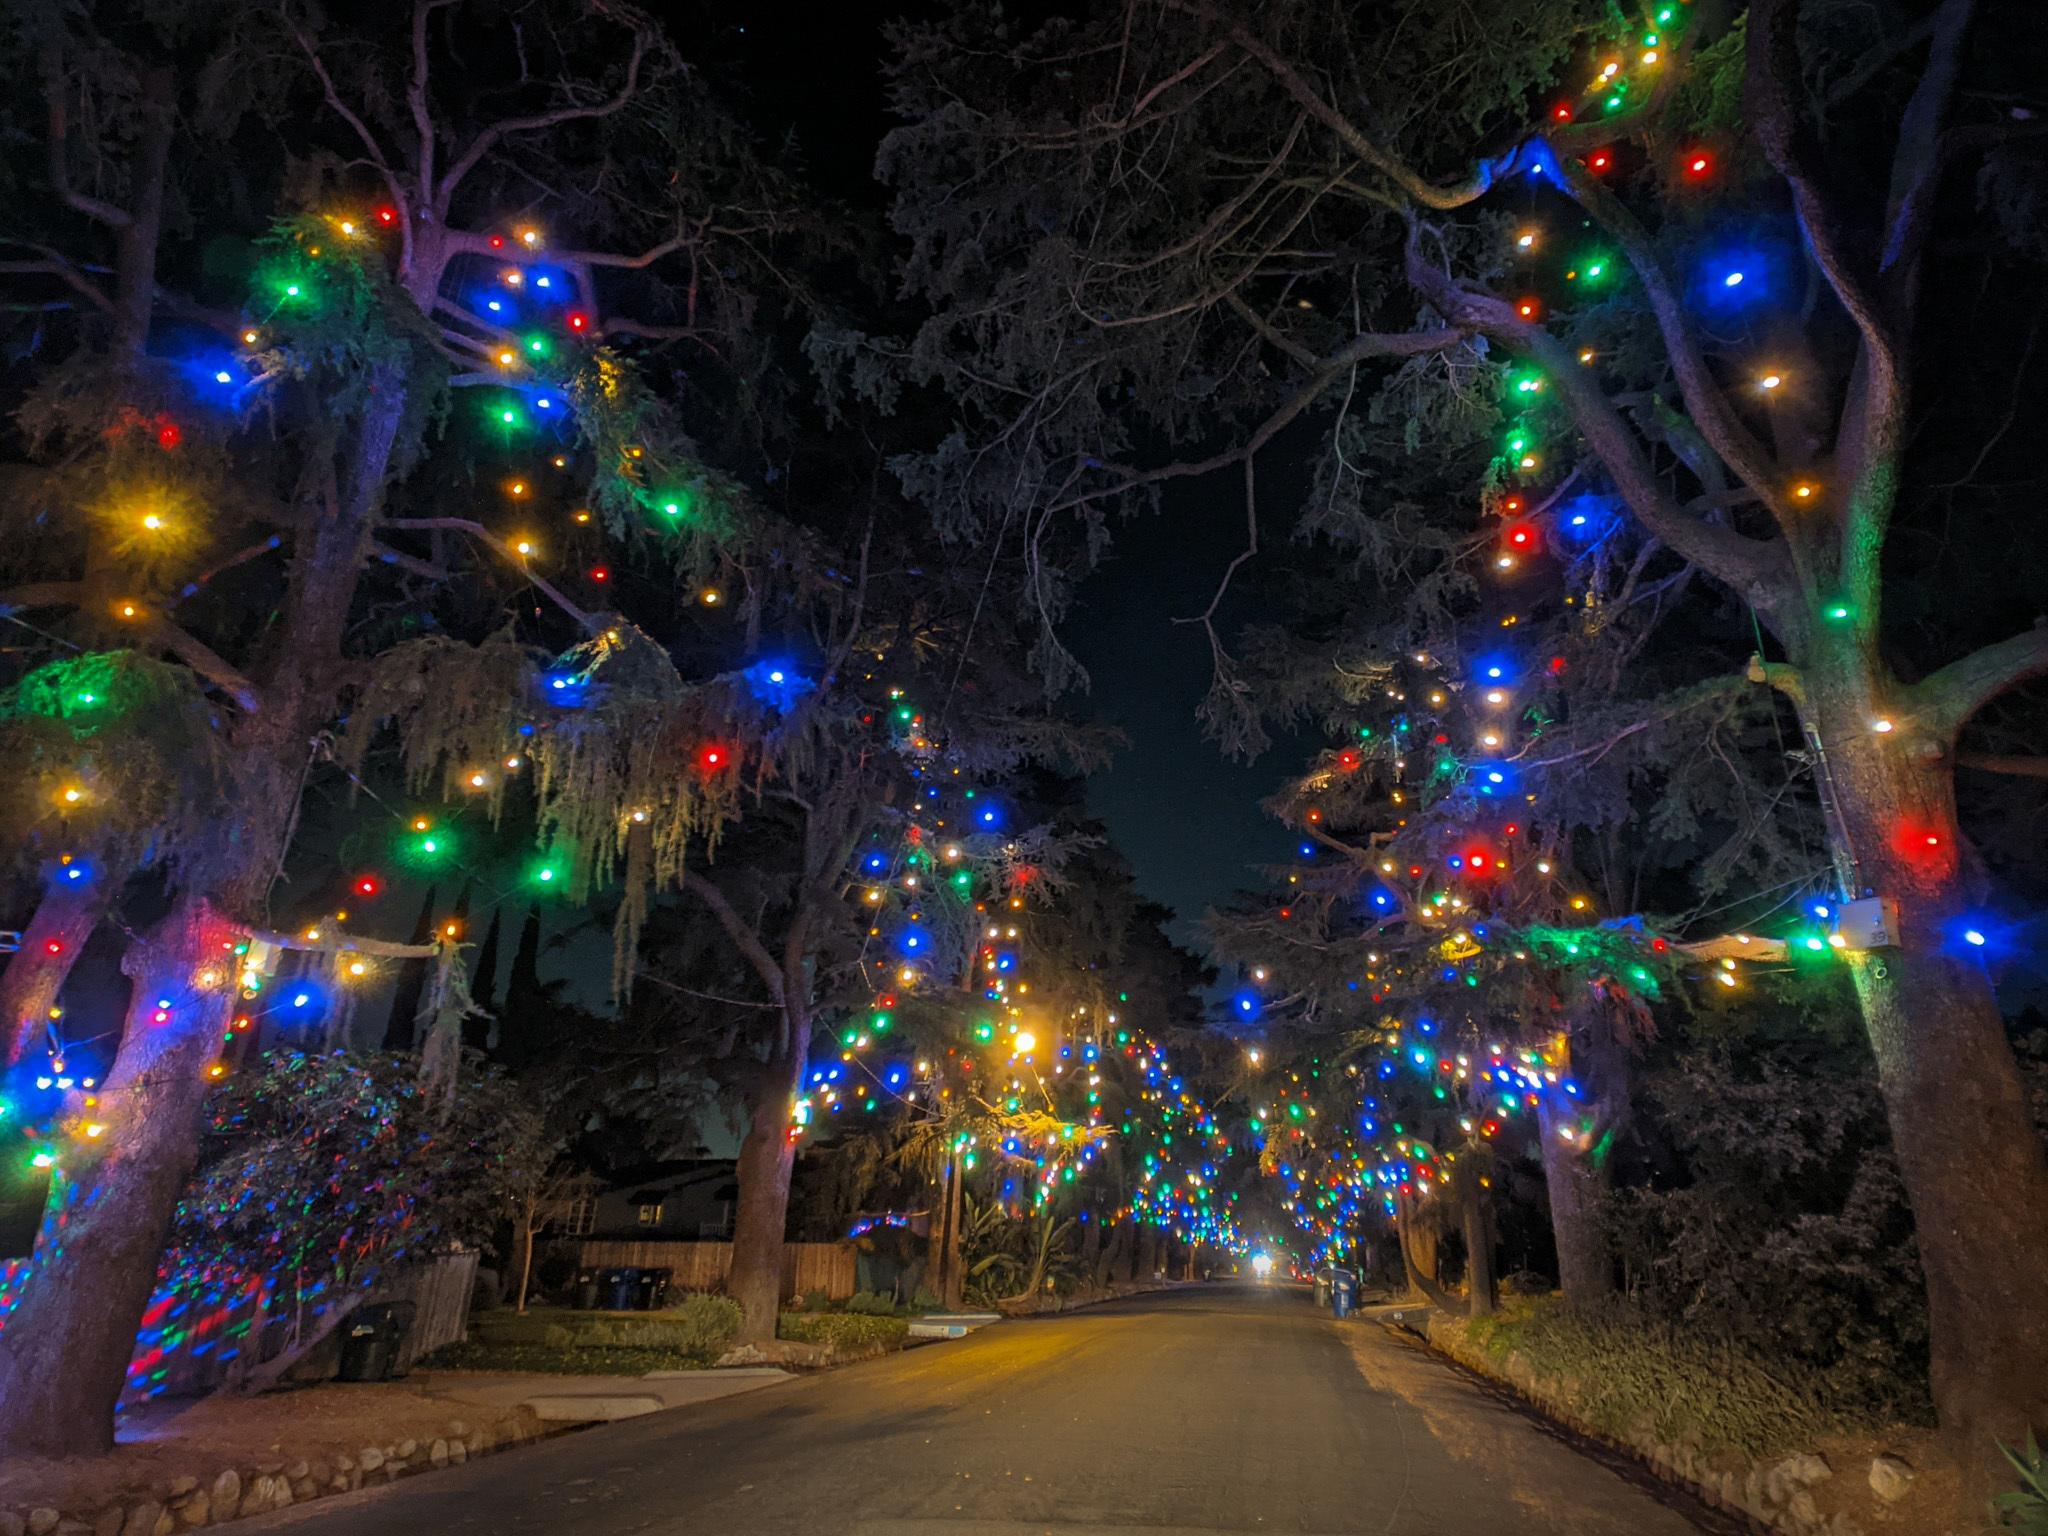 Christmas Plays In Los Angeles 2021 0aodz2yvr93ypm